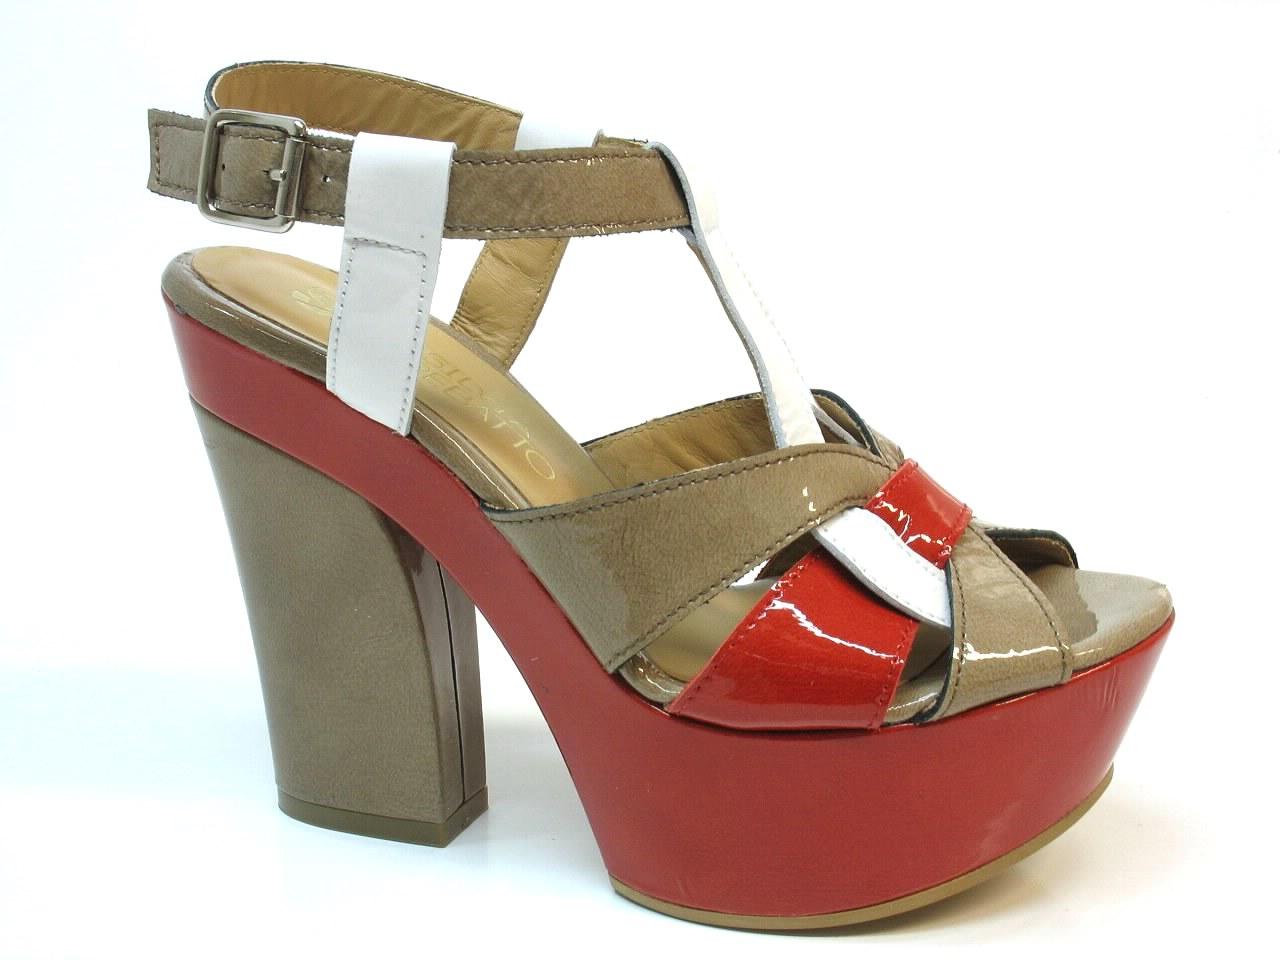 Heel Sandals Silvia Rebatto - 019 S8858